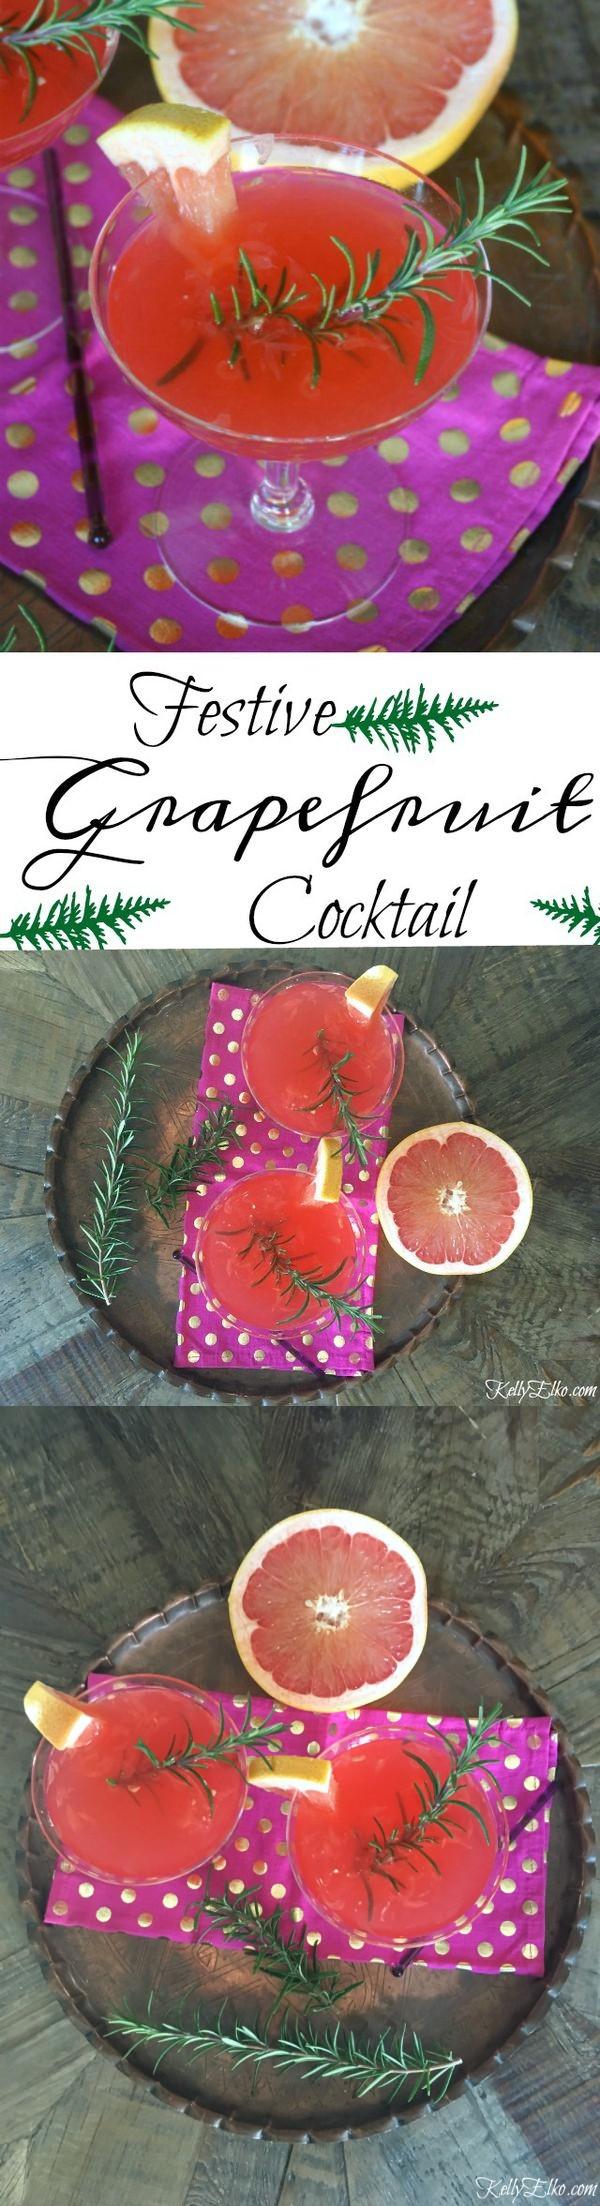 Festive Grapefruit Cocktail